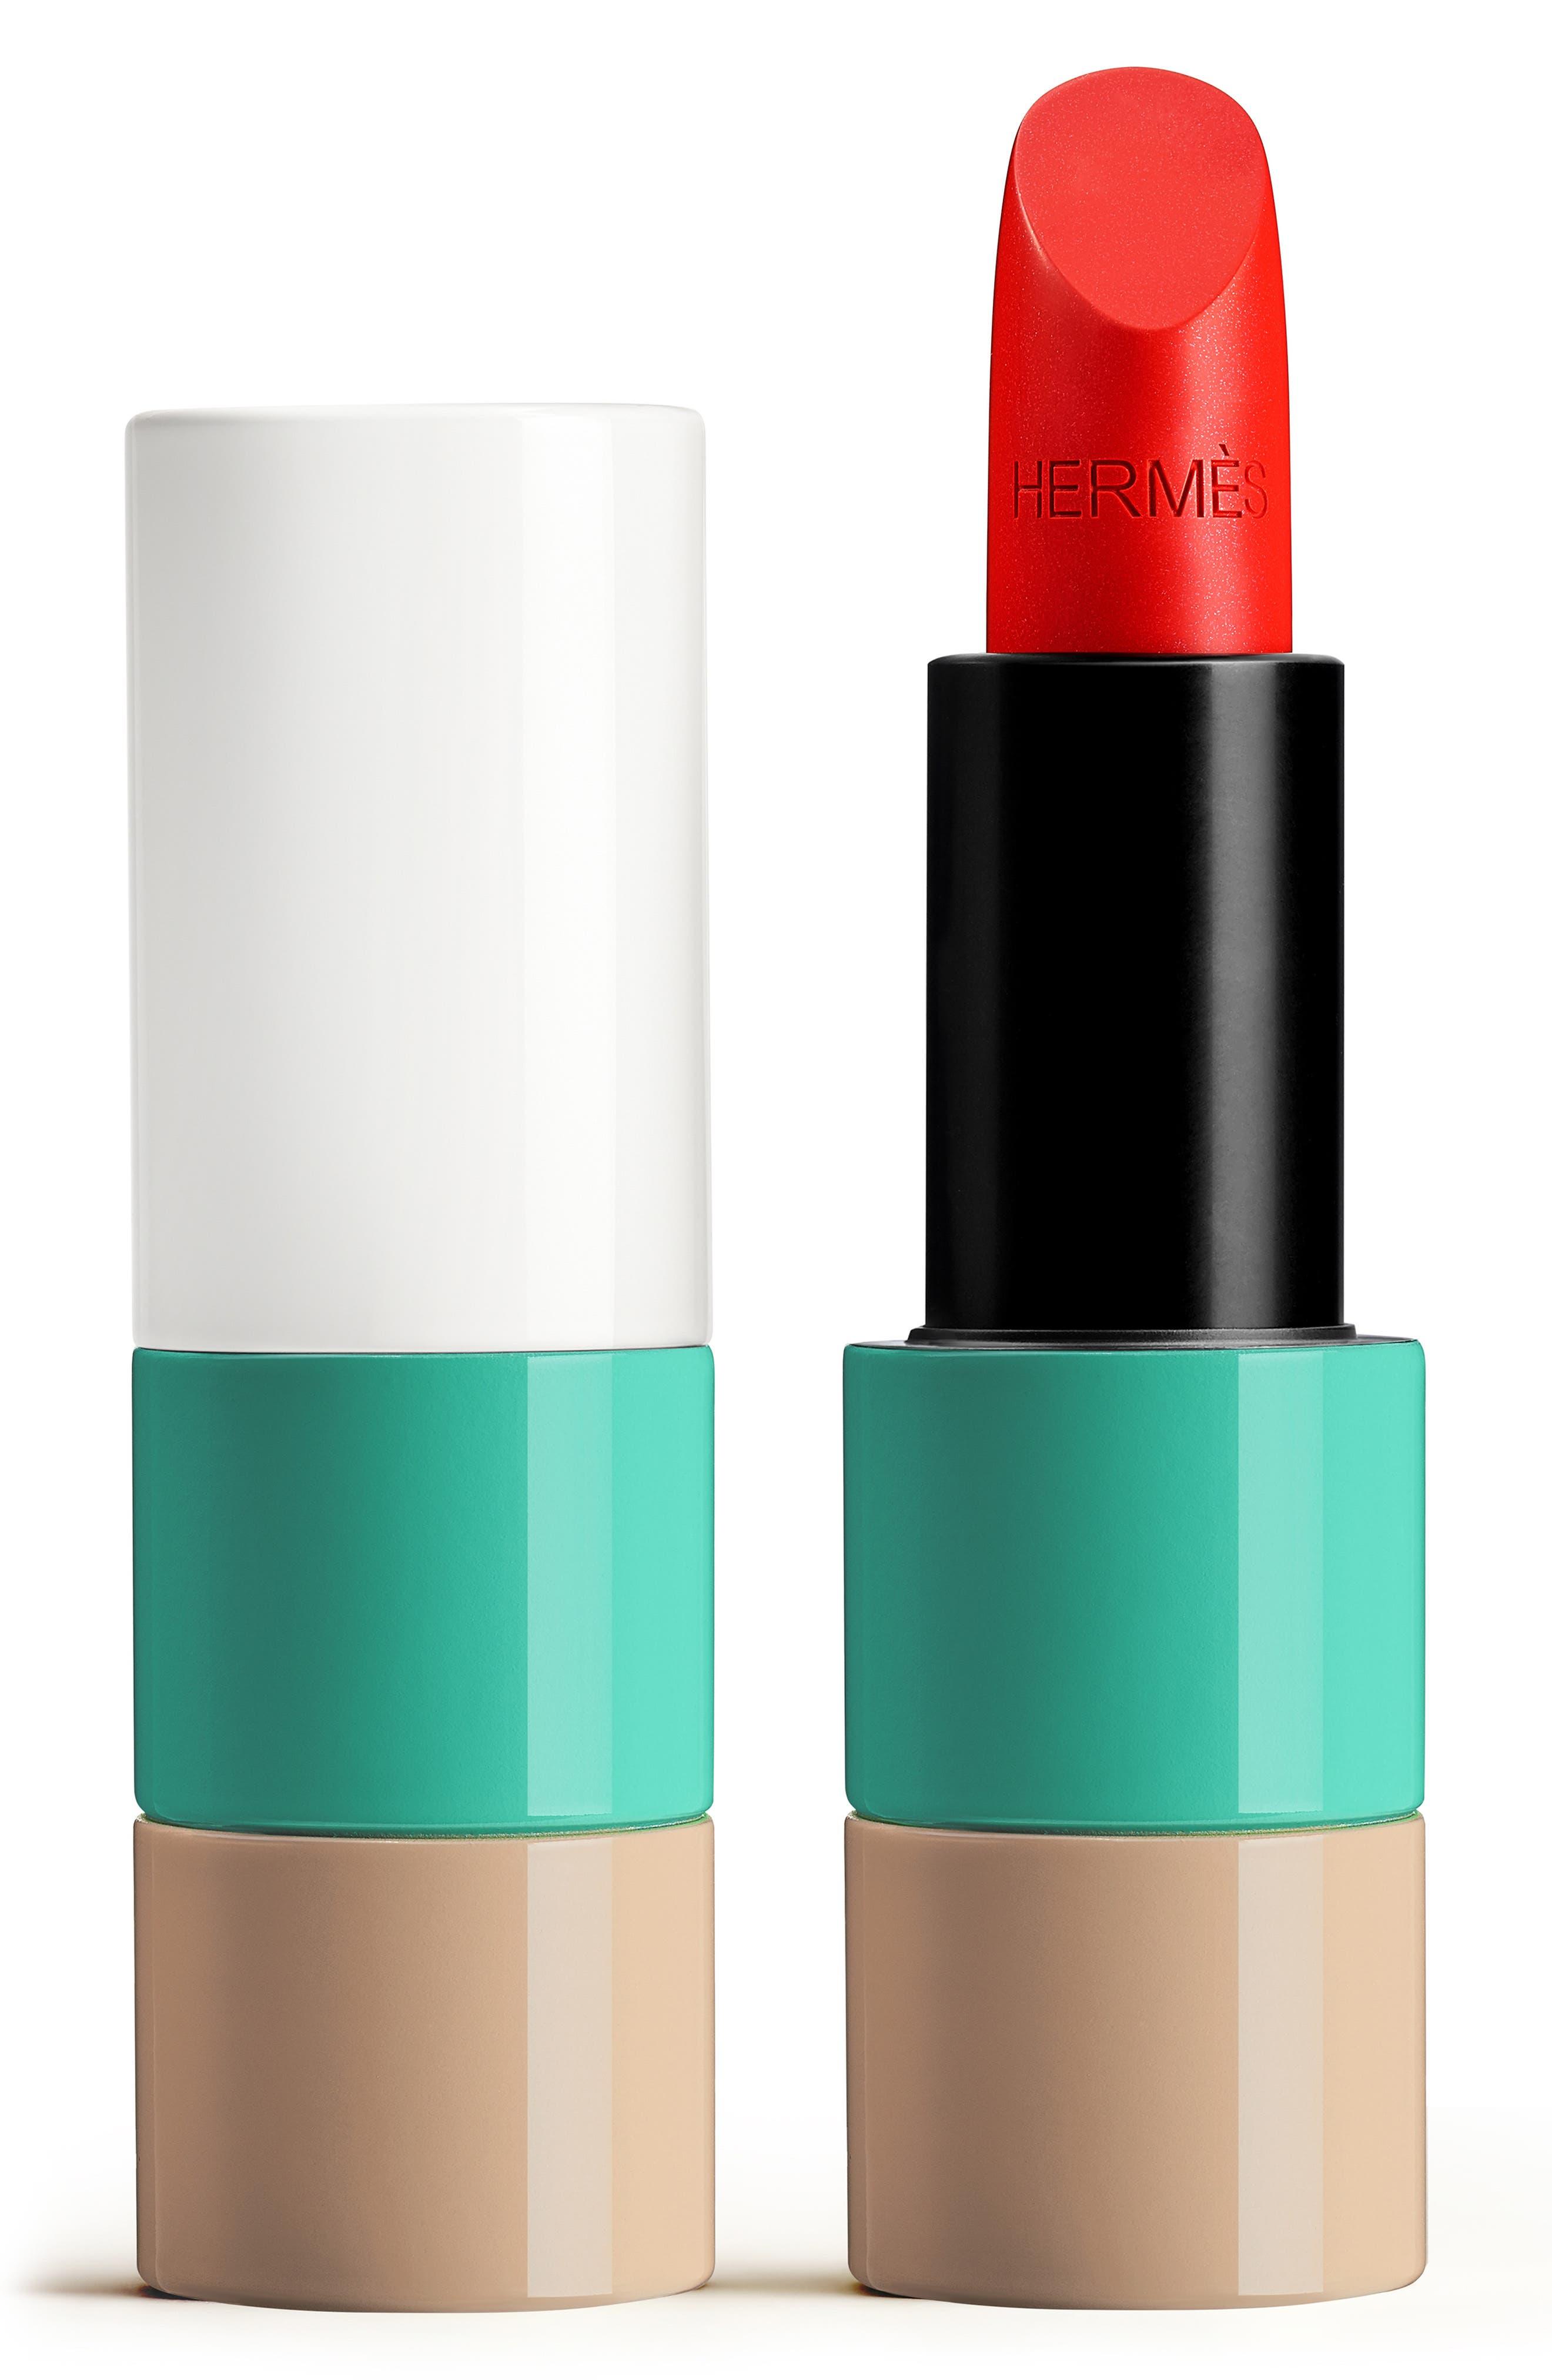 52 Corail Aqua Rouge Hermès - Satin Lipstick   Nordstrom